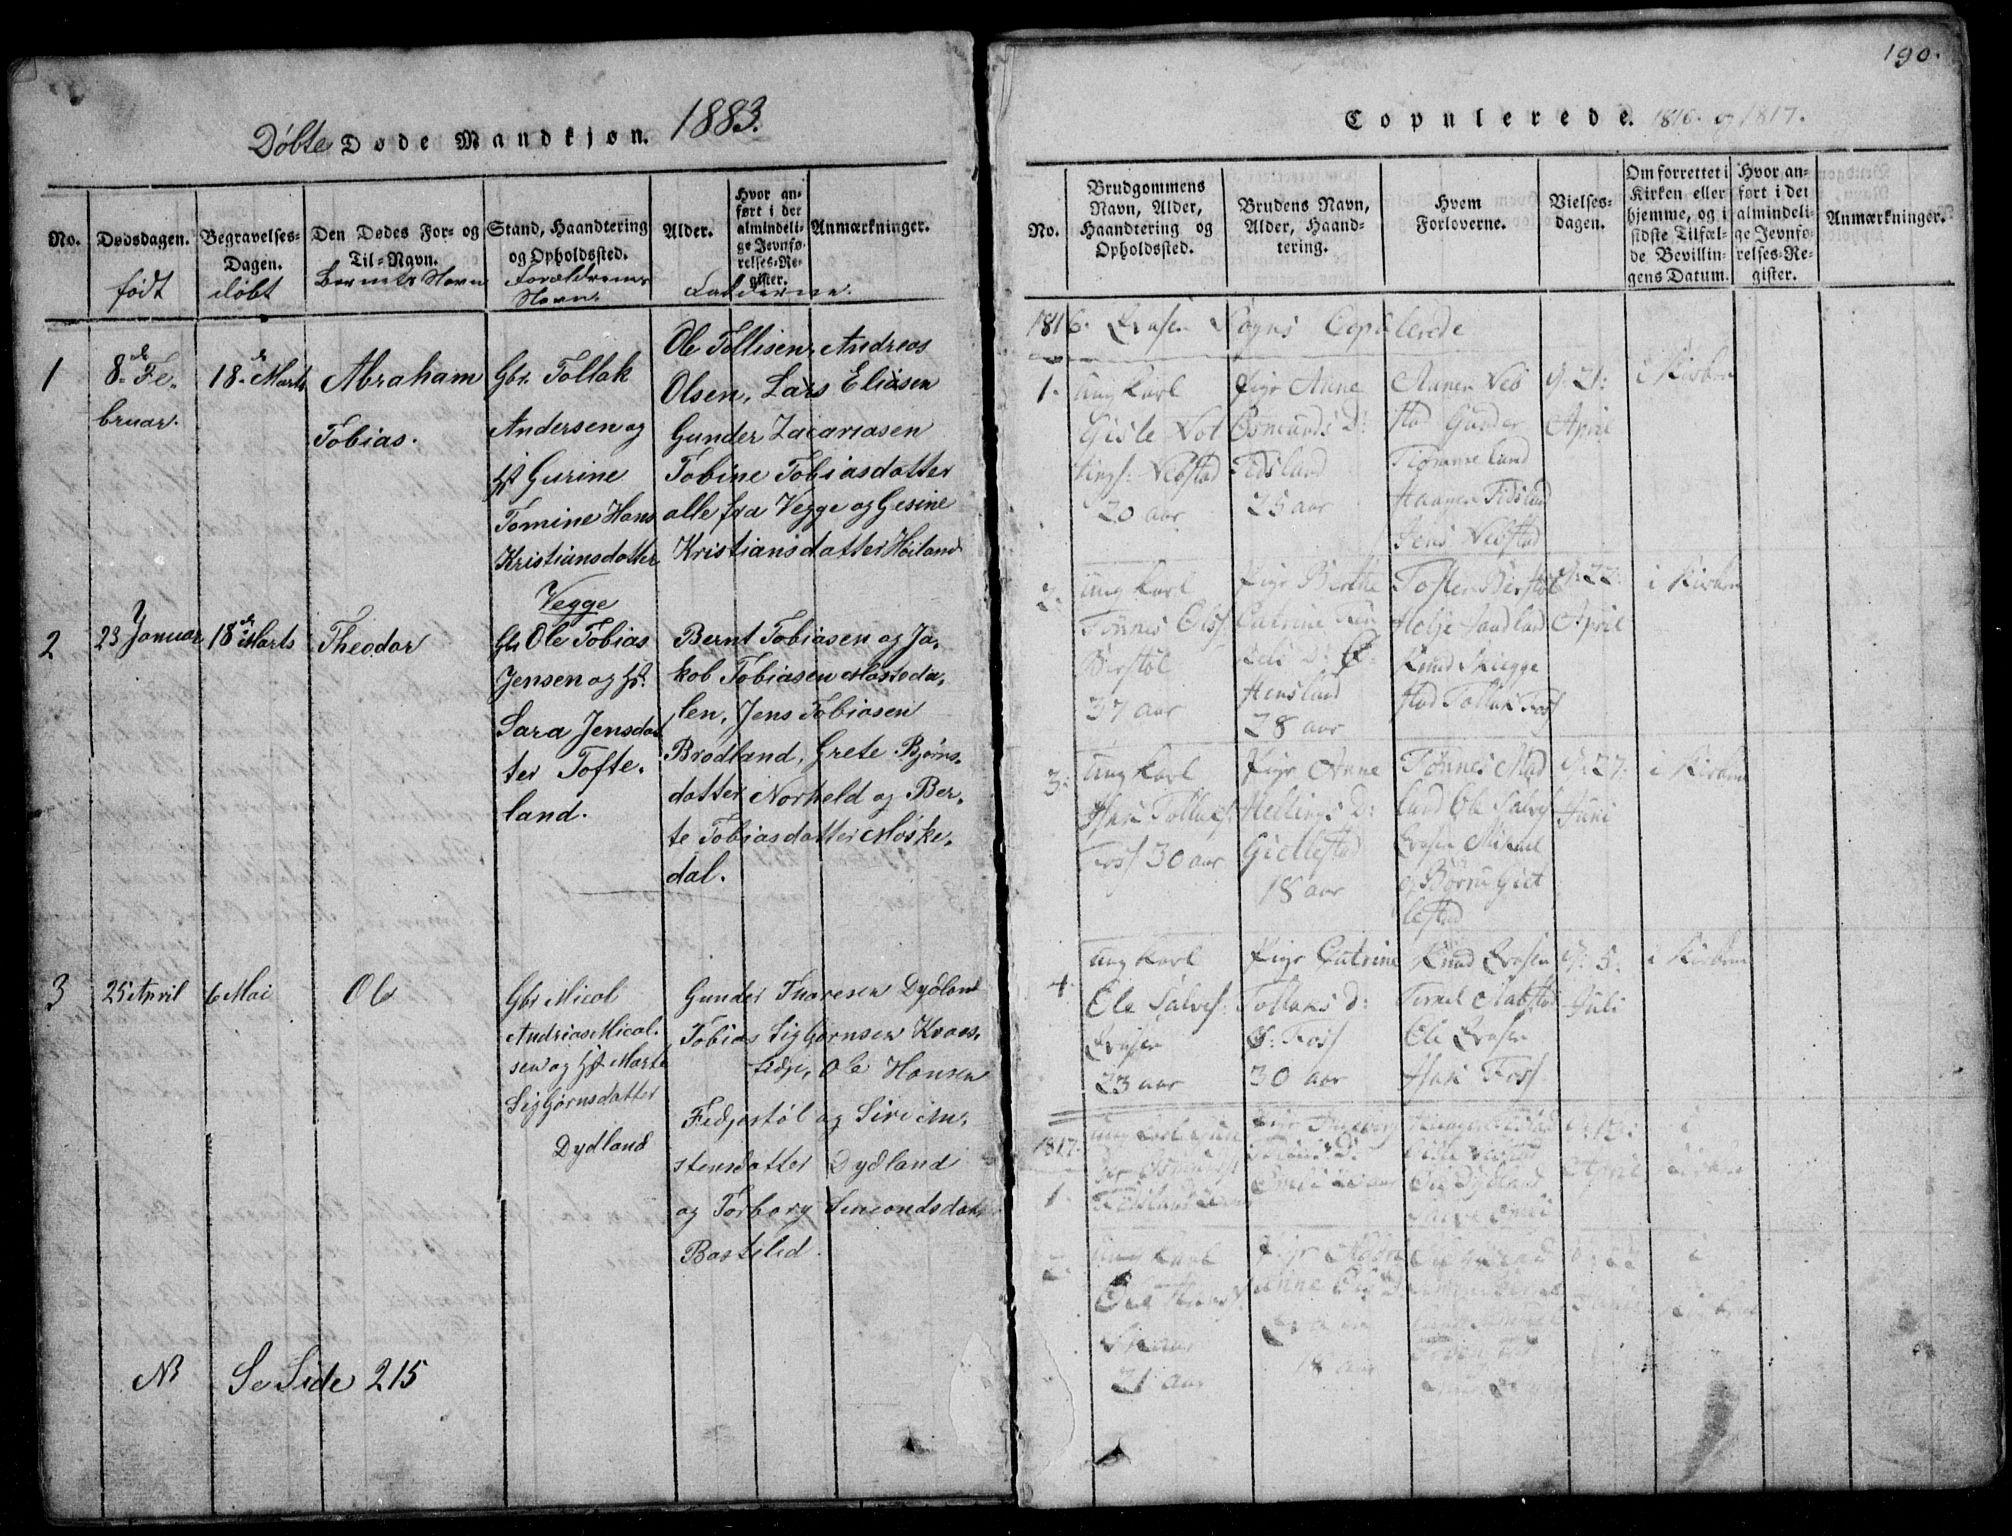 SAK, Lyngdal sokneprestkontor, F/Fb/Fbb/L0001: Klokkerbok nr. B 1, 1816-1900, s. 190